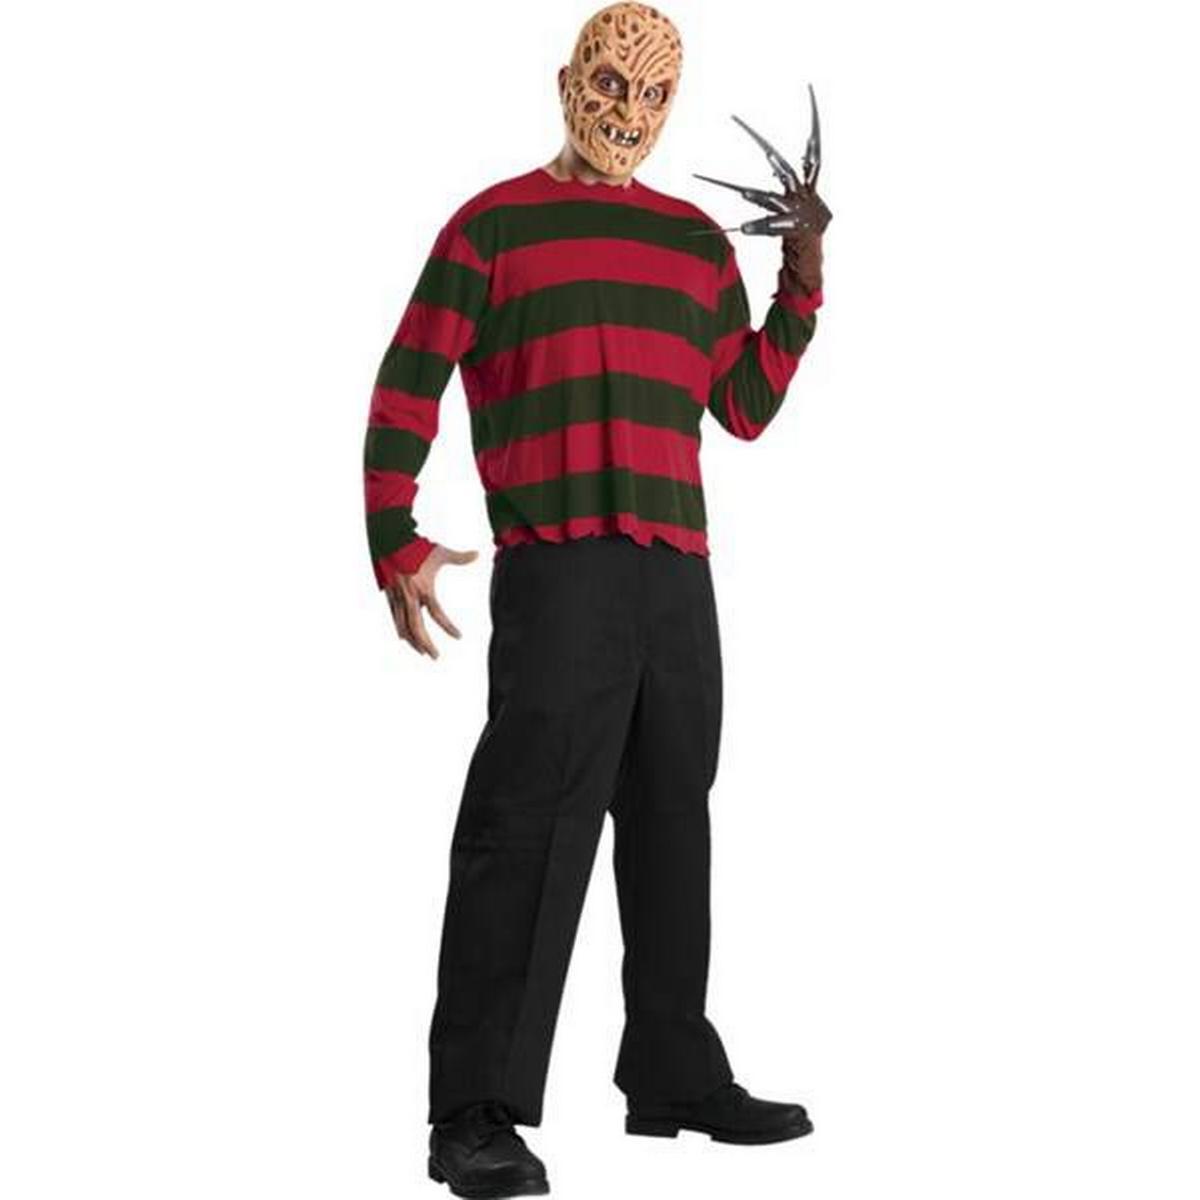 Halloween Maskerad.Skjortor Halloween Maskerad Jamfor Priser Pa Skjorta